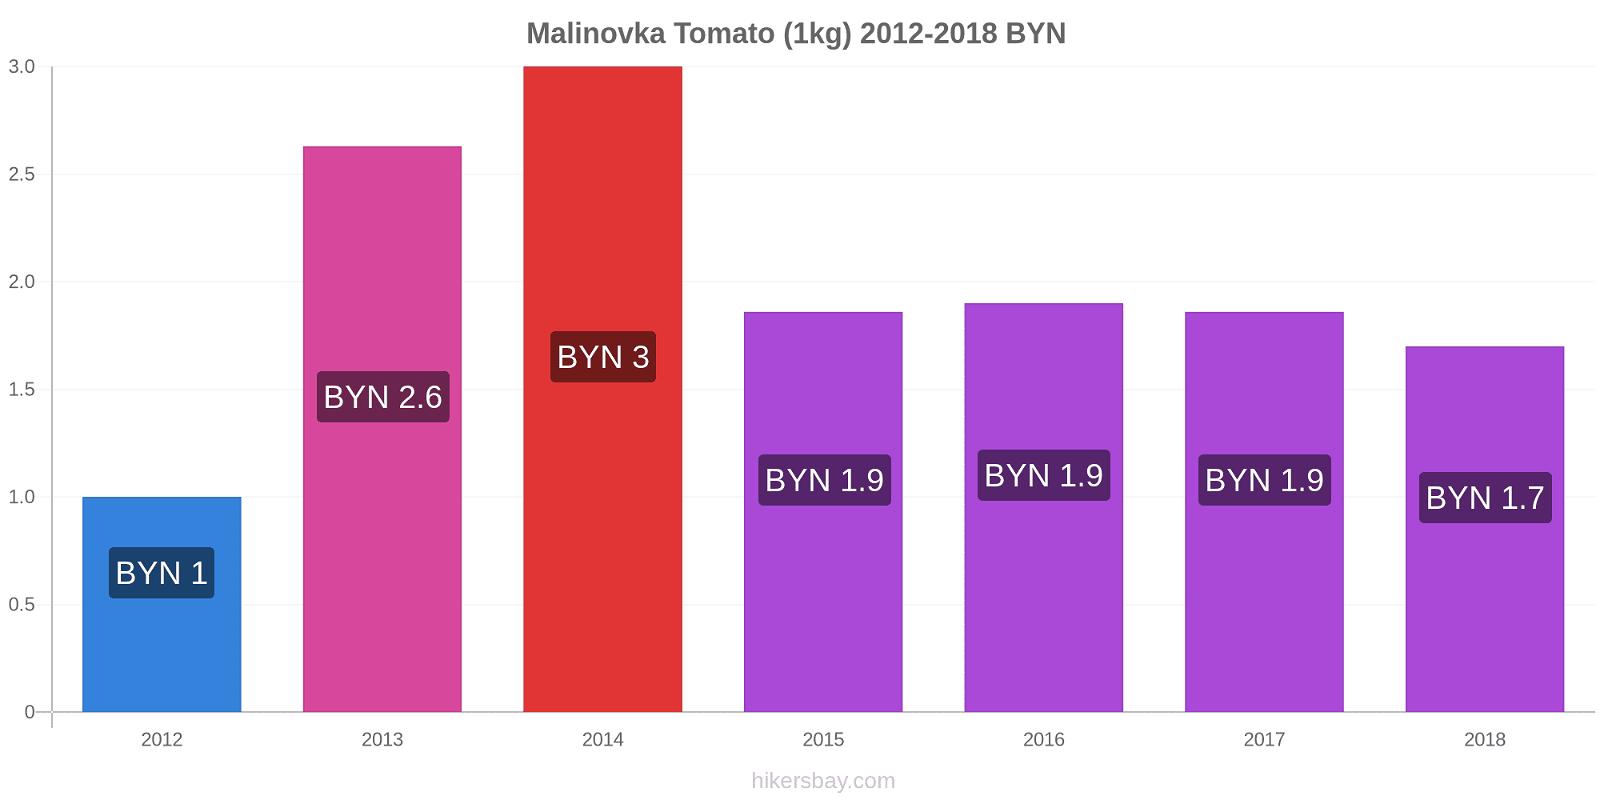 Malinovka price changes Tomato (1kg) hikersbay.com